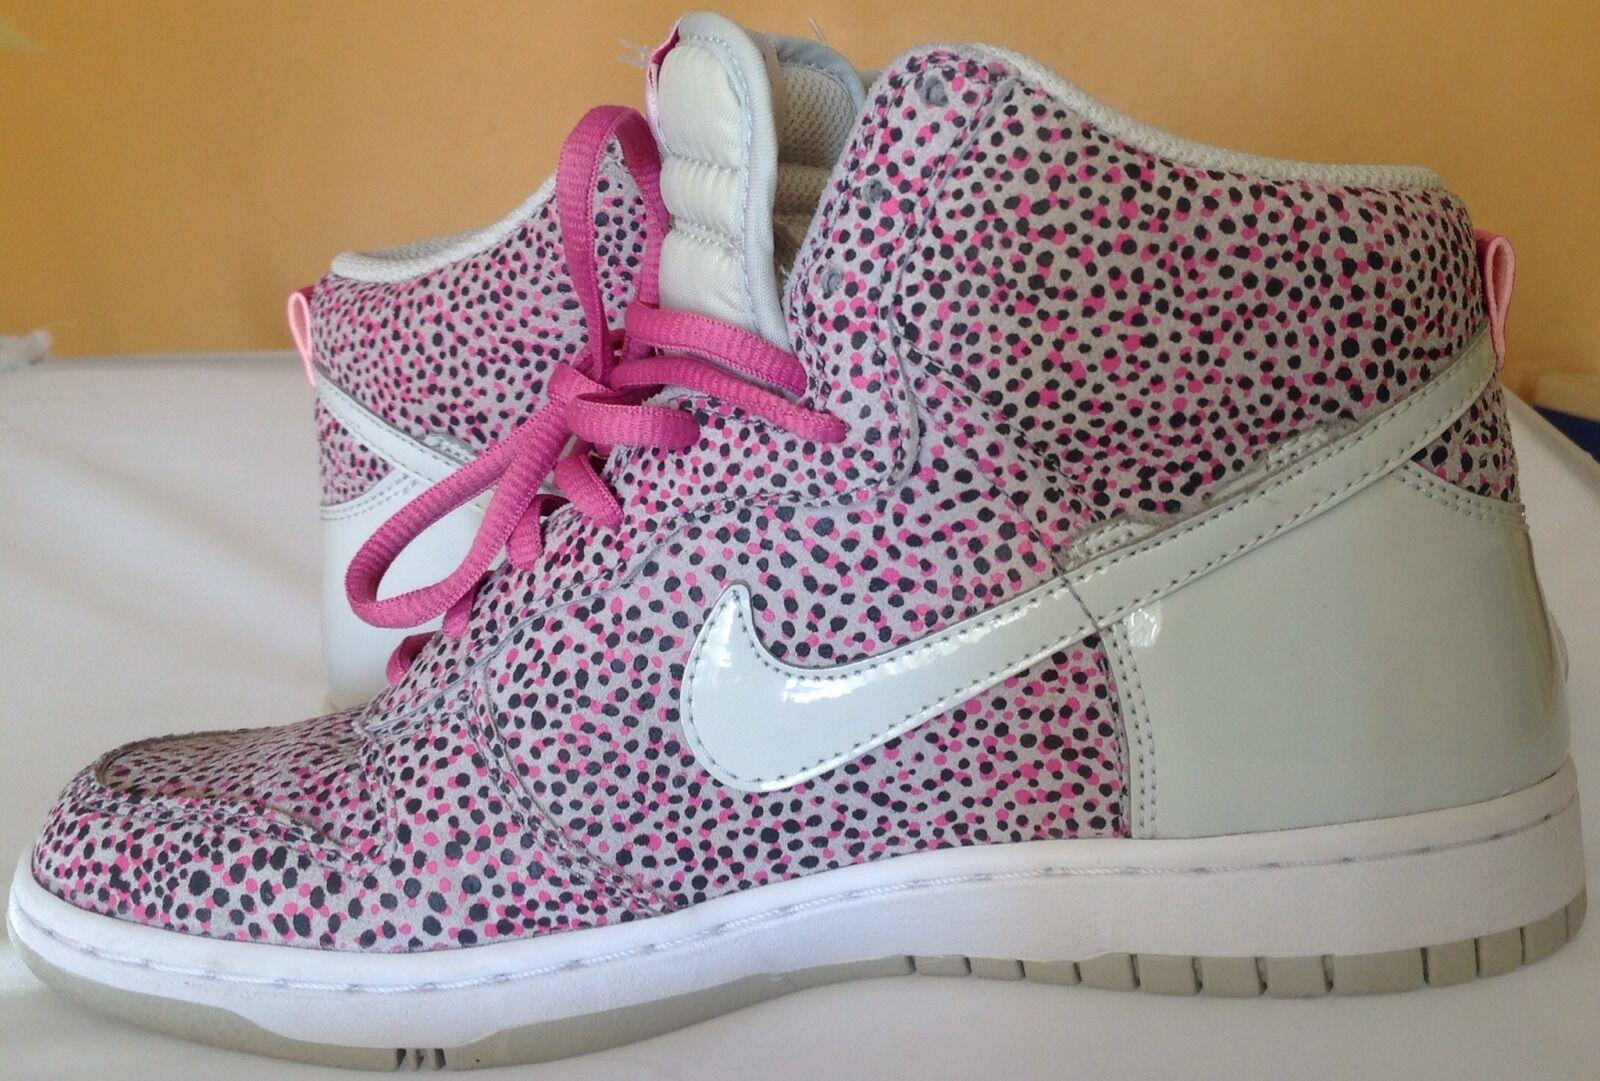 official photos 6db49 1bf9c Nike Women Dunk Hi Hi Hi Skinny Print Sneaker Shoe 543242-005 Grey Violet